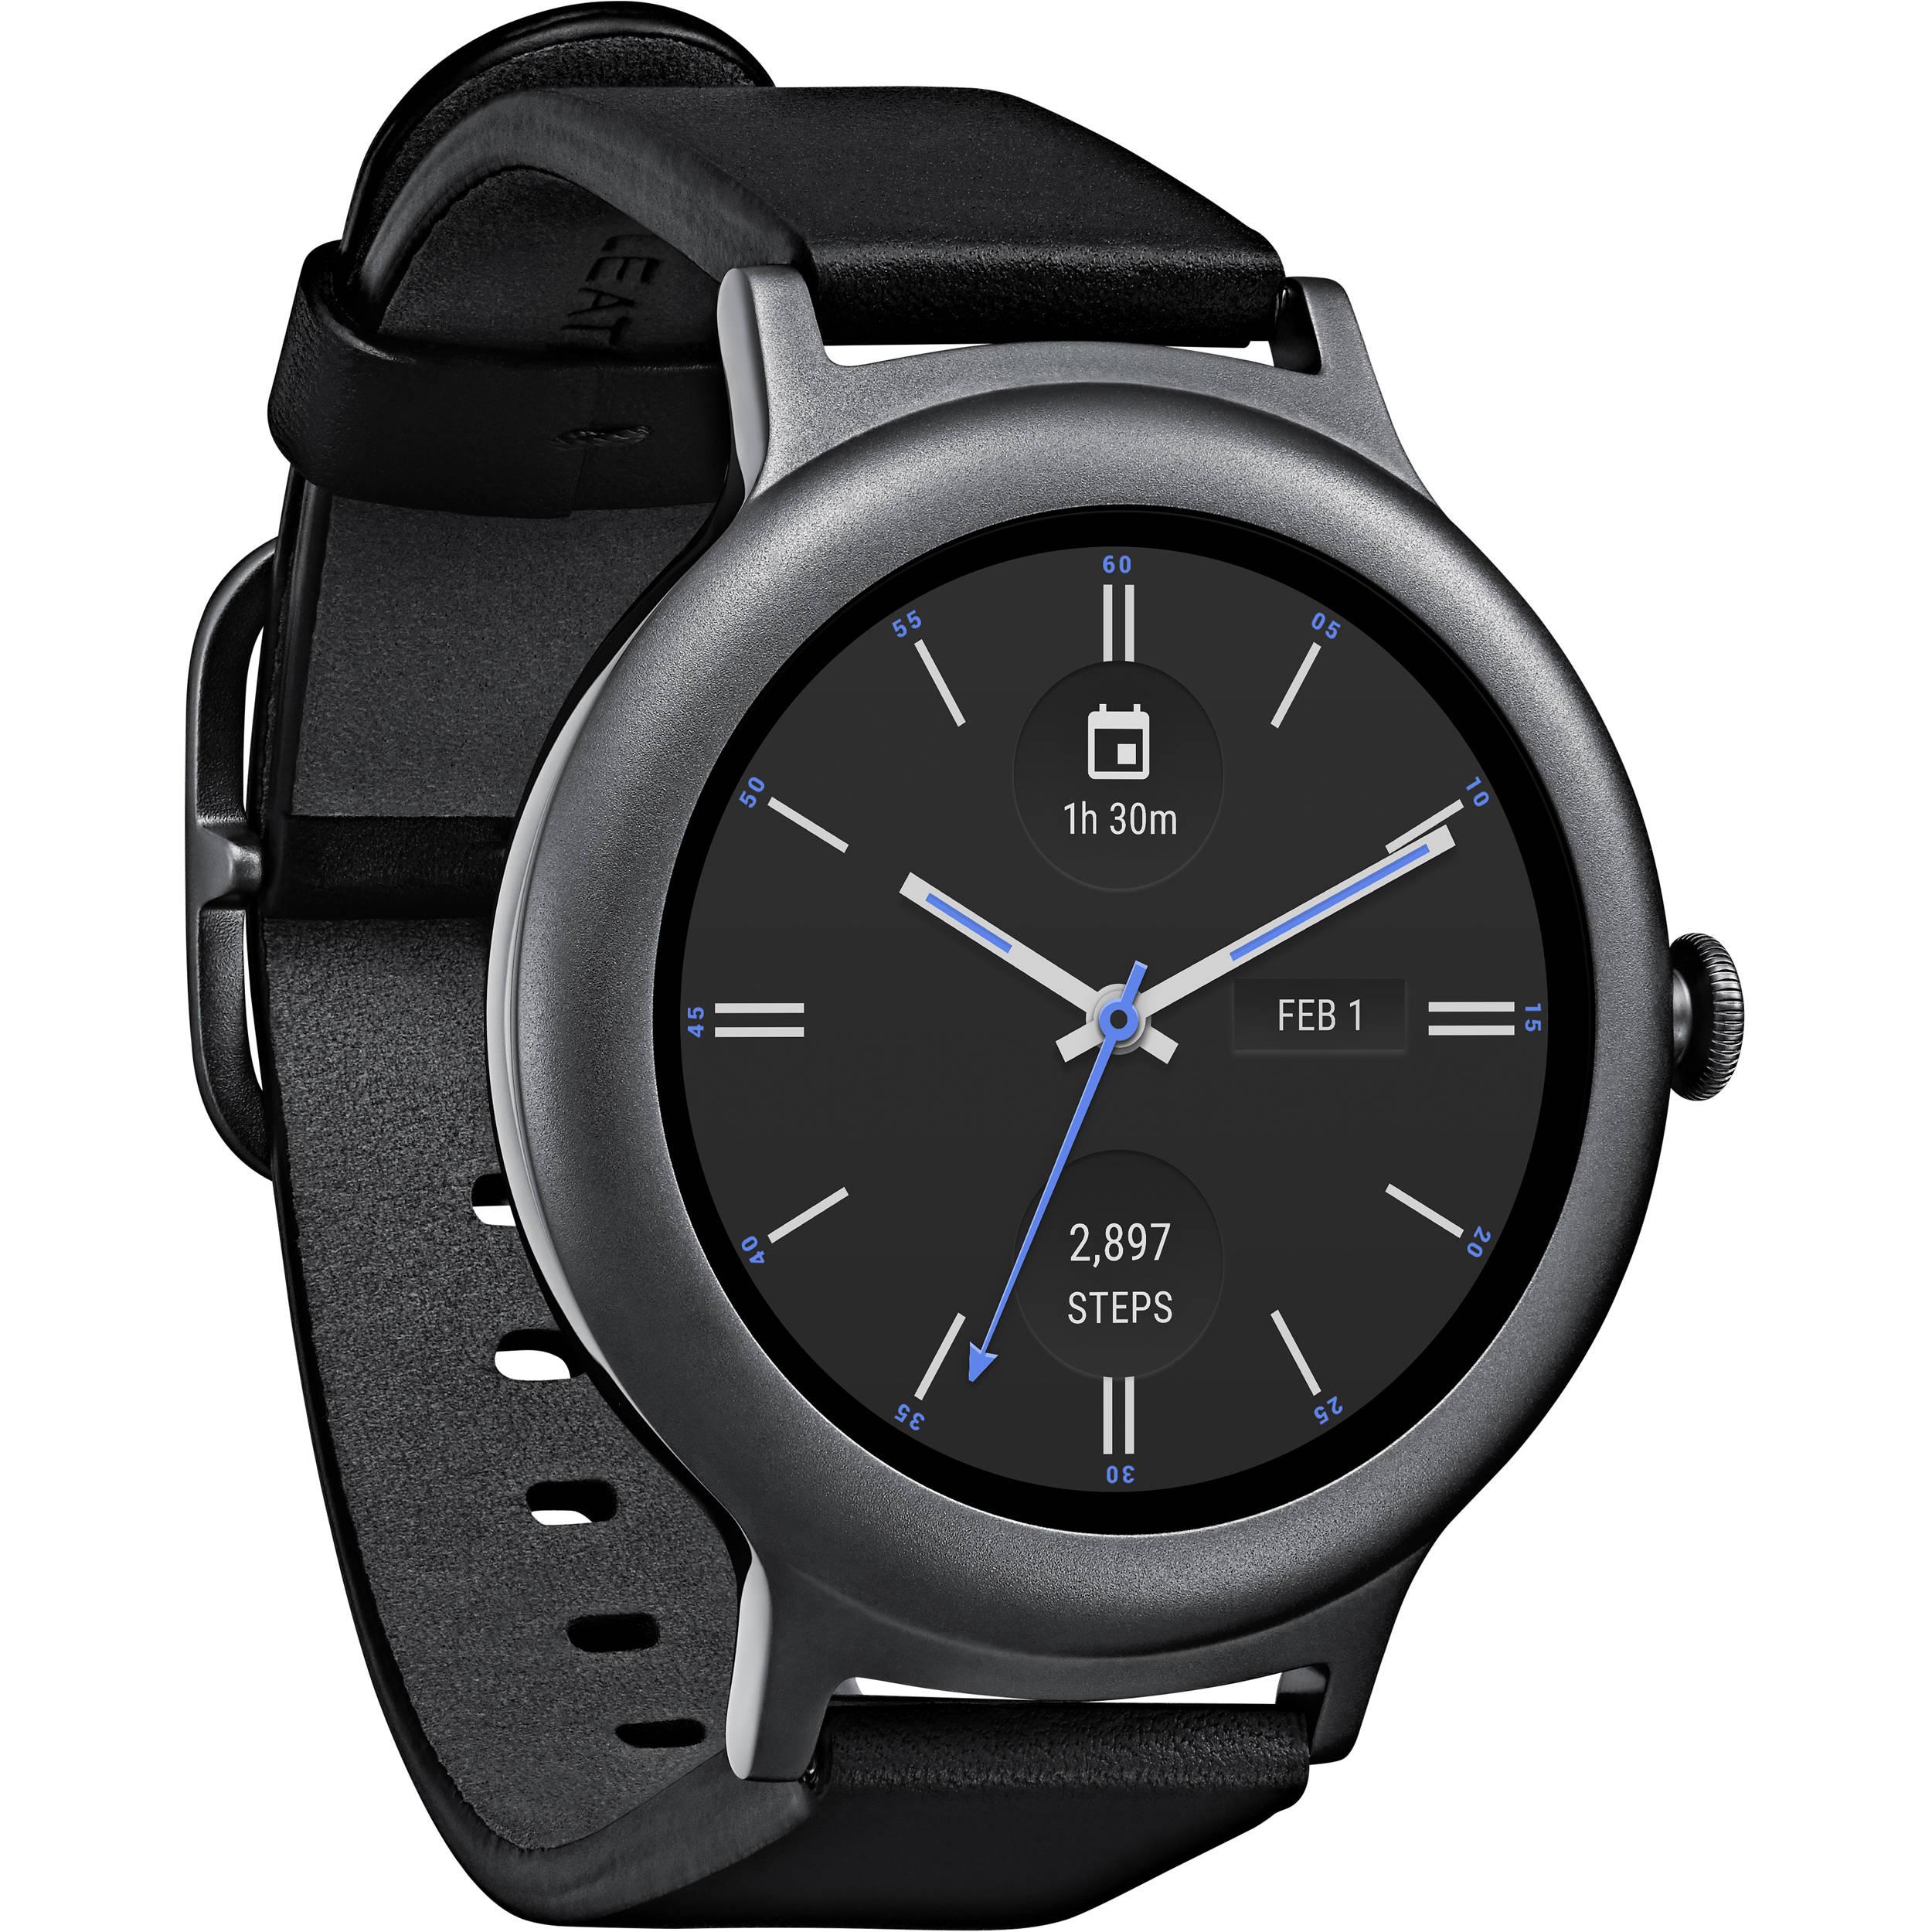 LG Watch Style Smartwatch (Titanium) LGW270T B&H Photo Video